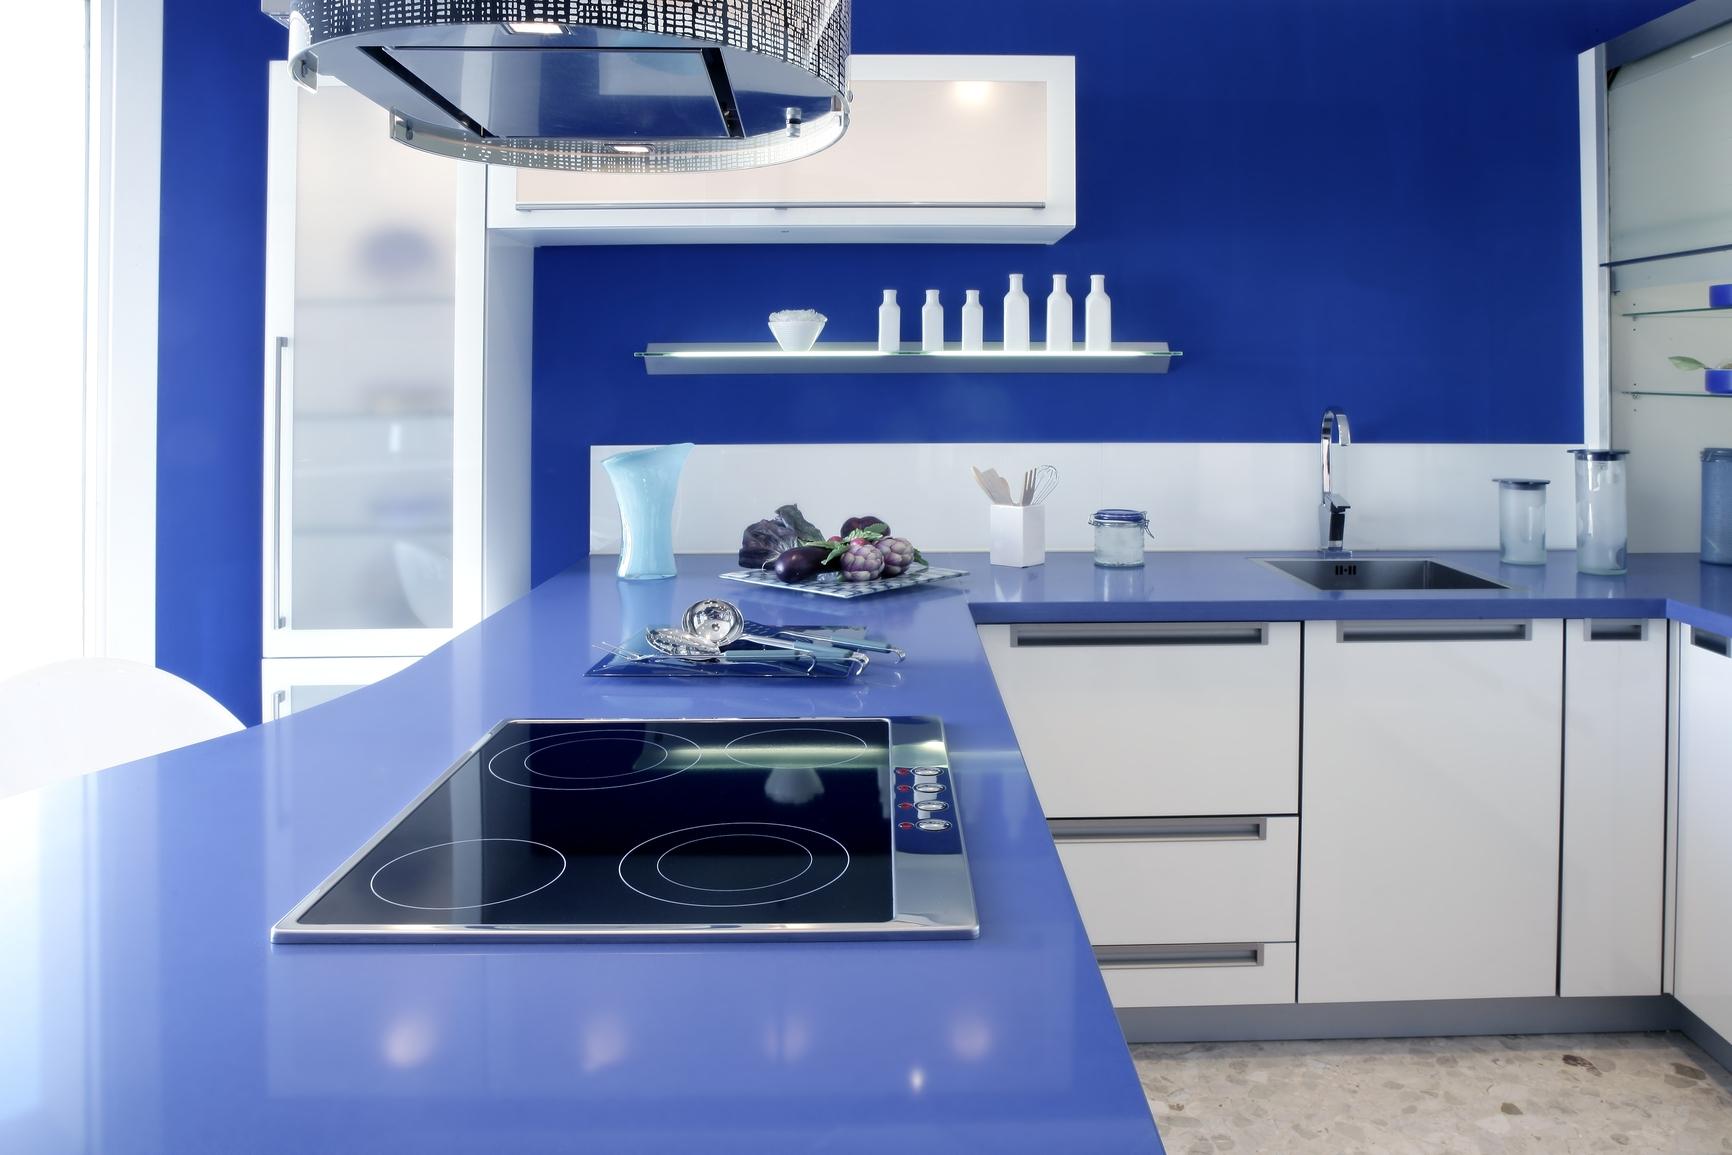 Дизайн кухни в синем тоне